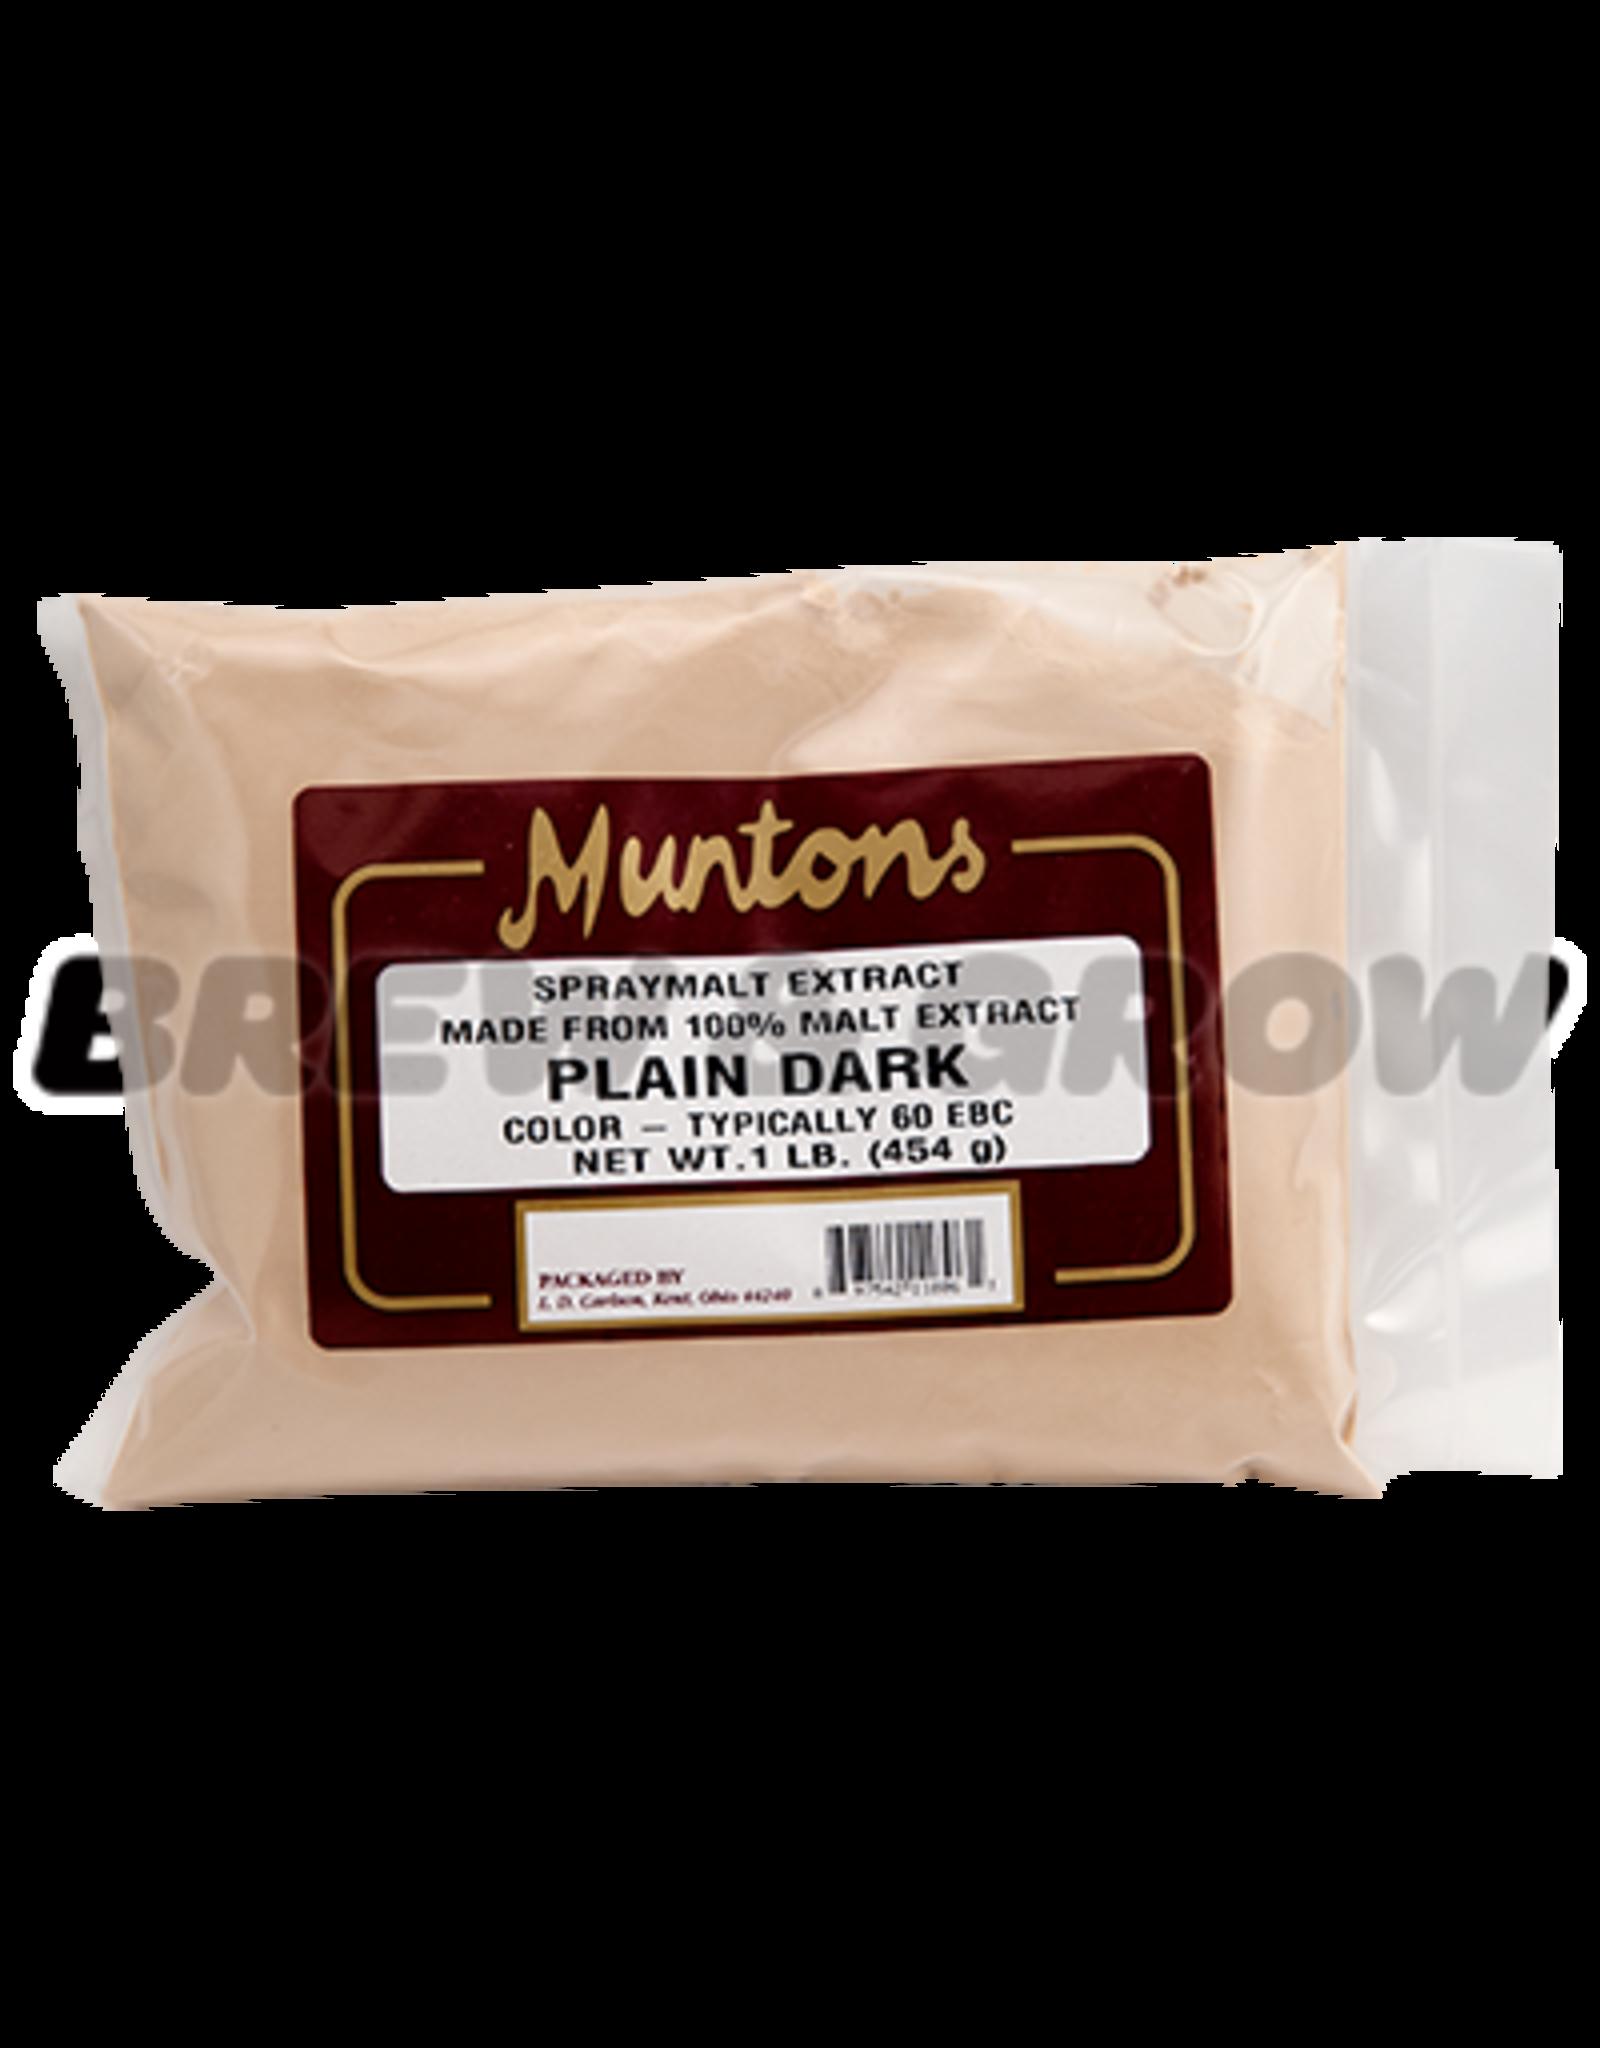 Muntons Dark 1 lb Dry Malt Extract